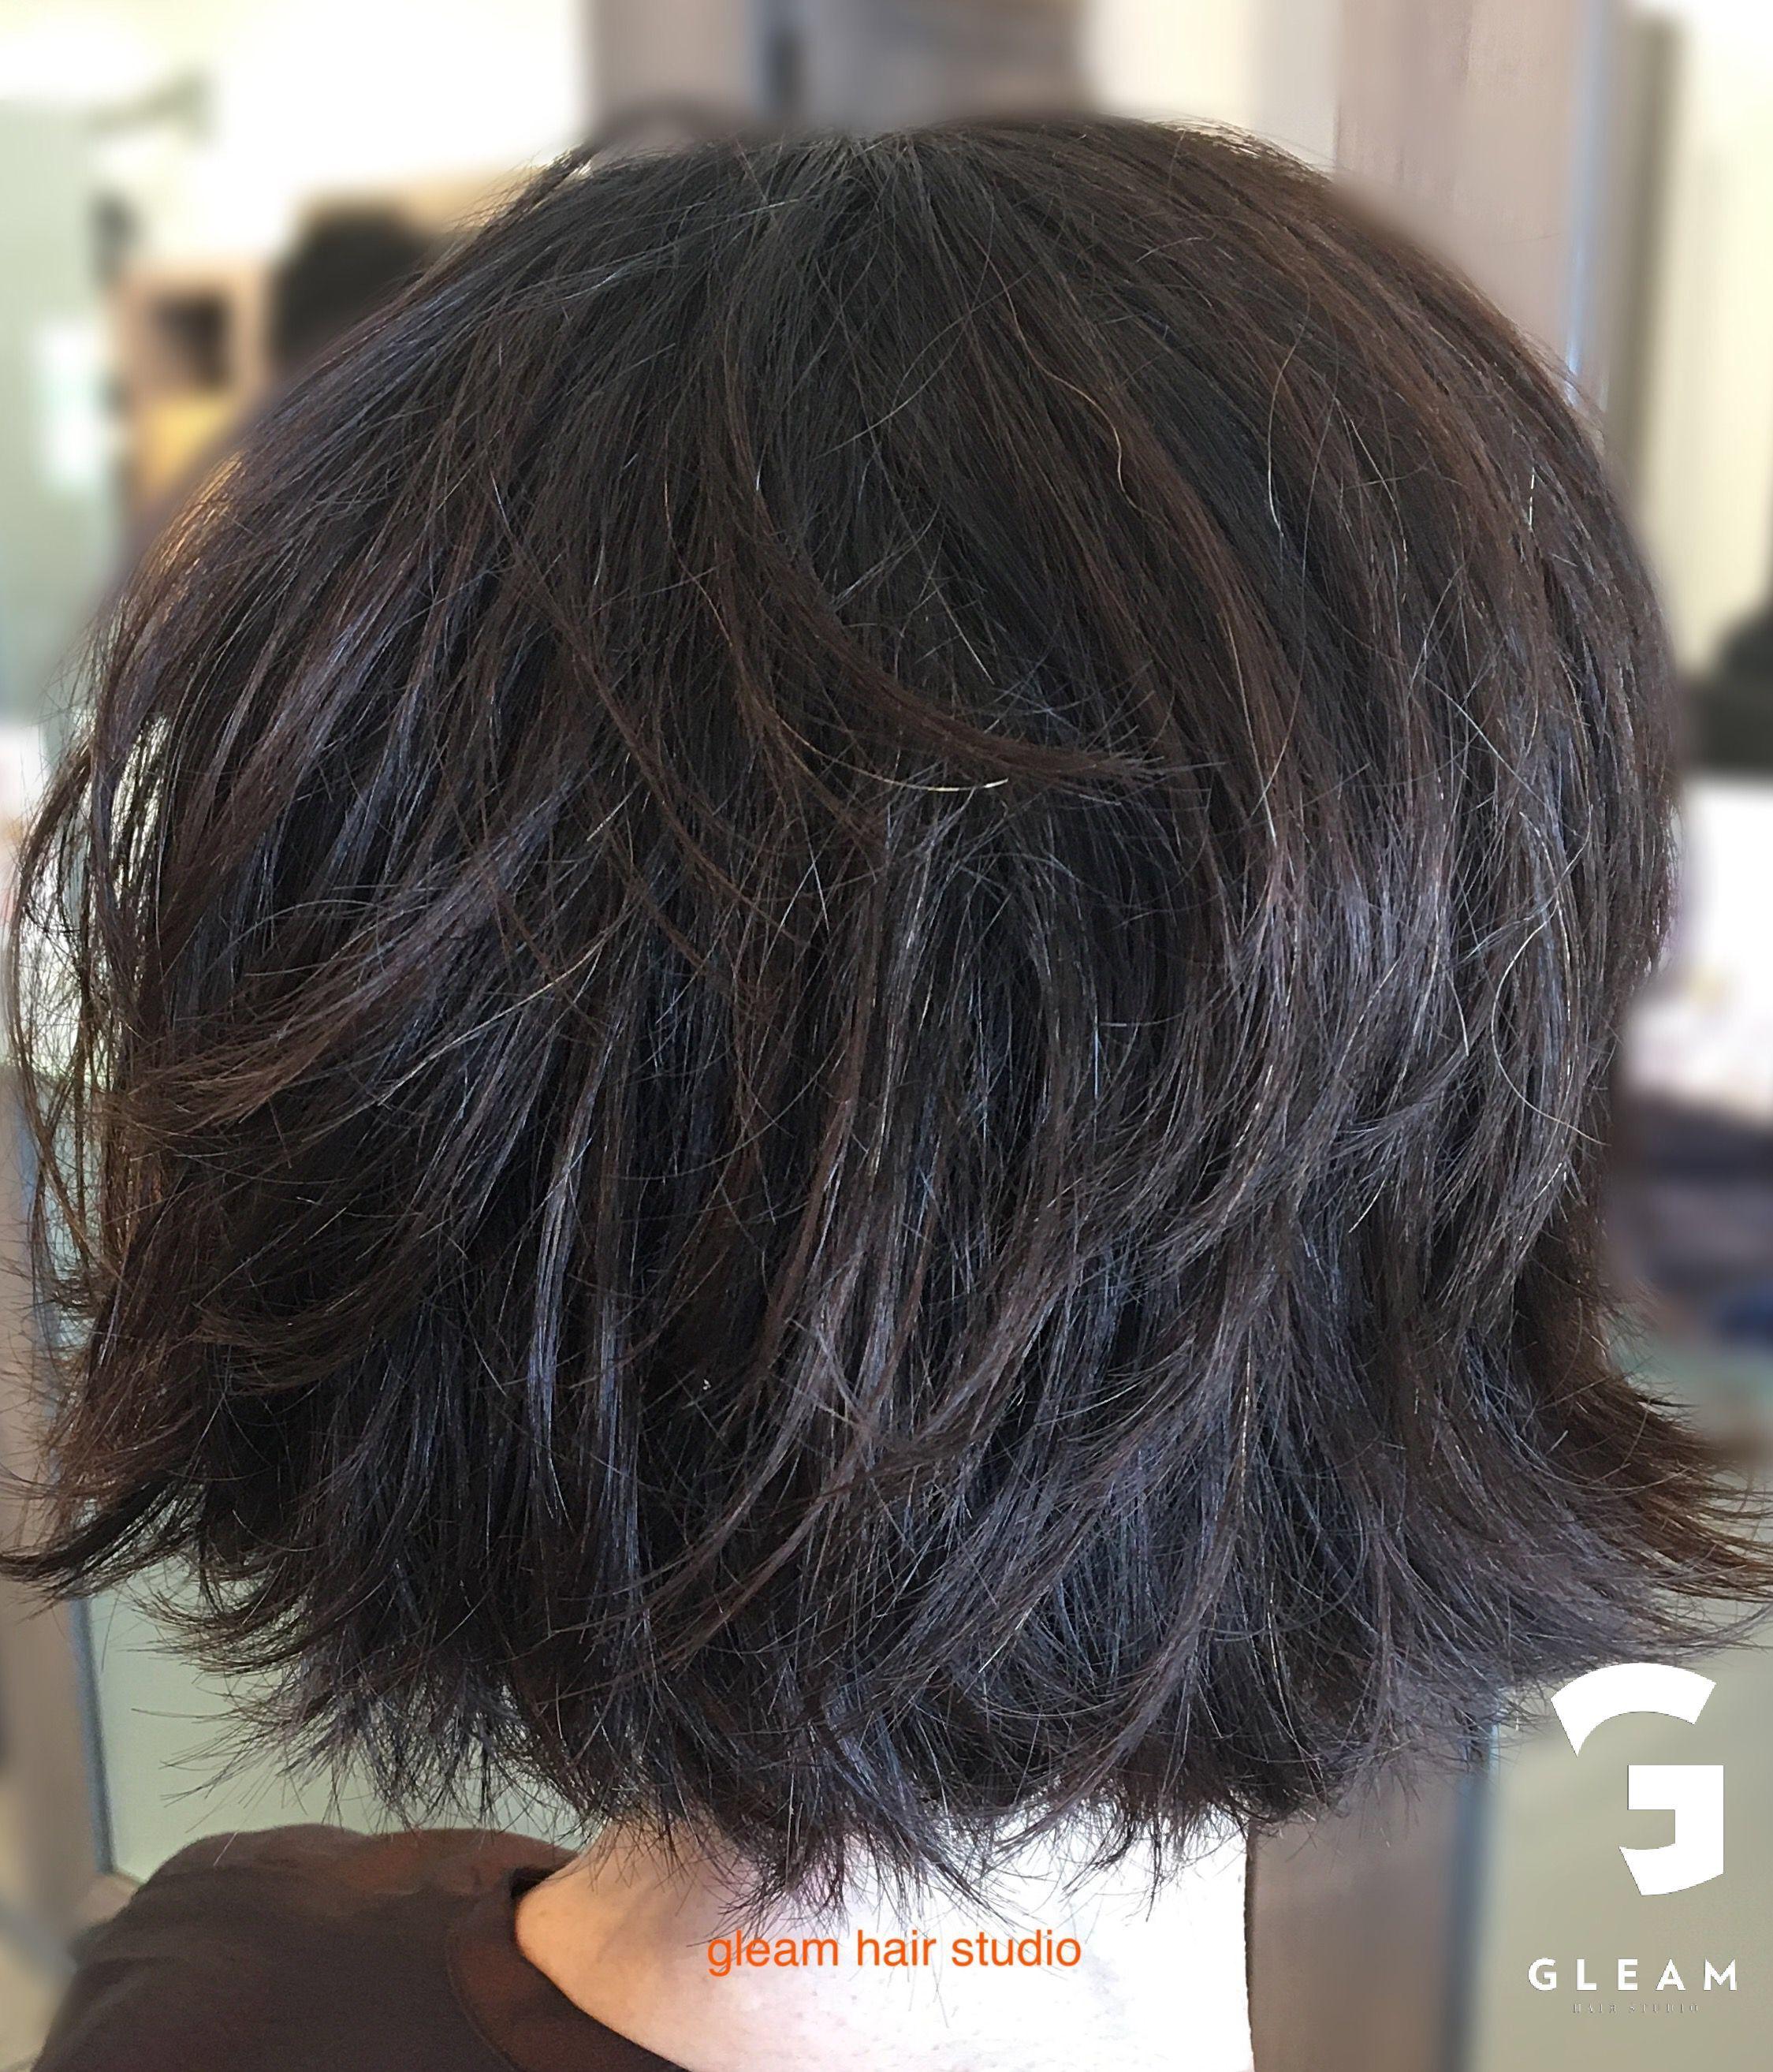 Edgy Wash And Wear Look Gleam Hair Studio Miami Hair Styles Long Hair Styles Choppy Hair